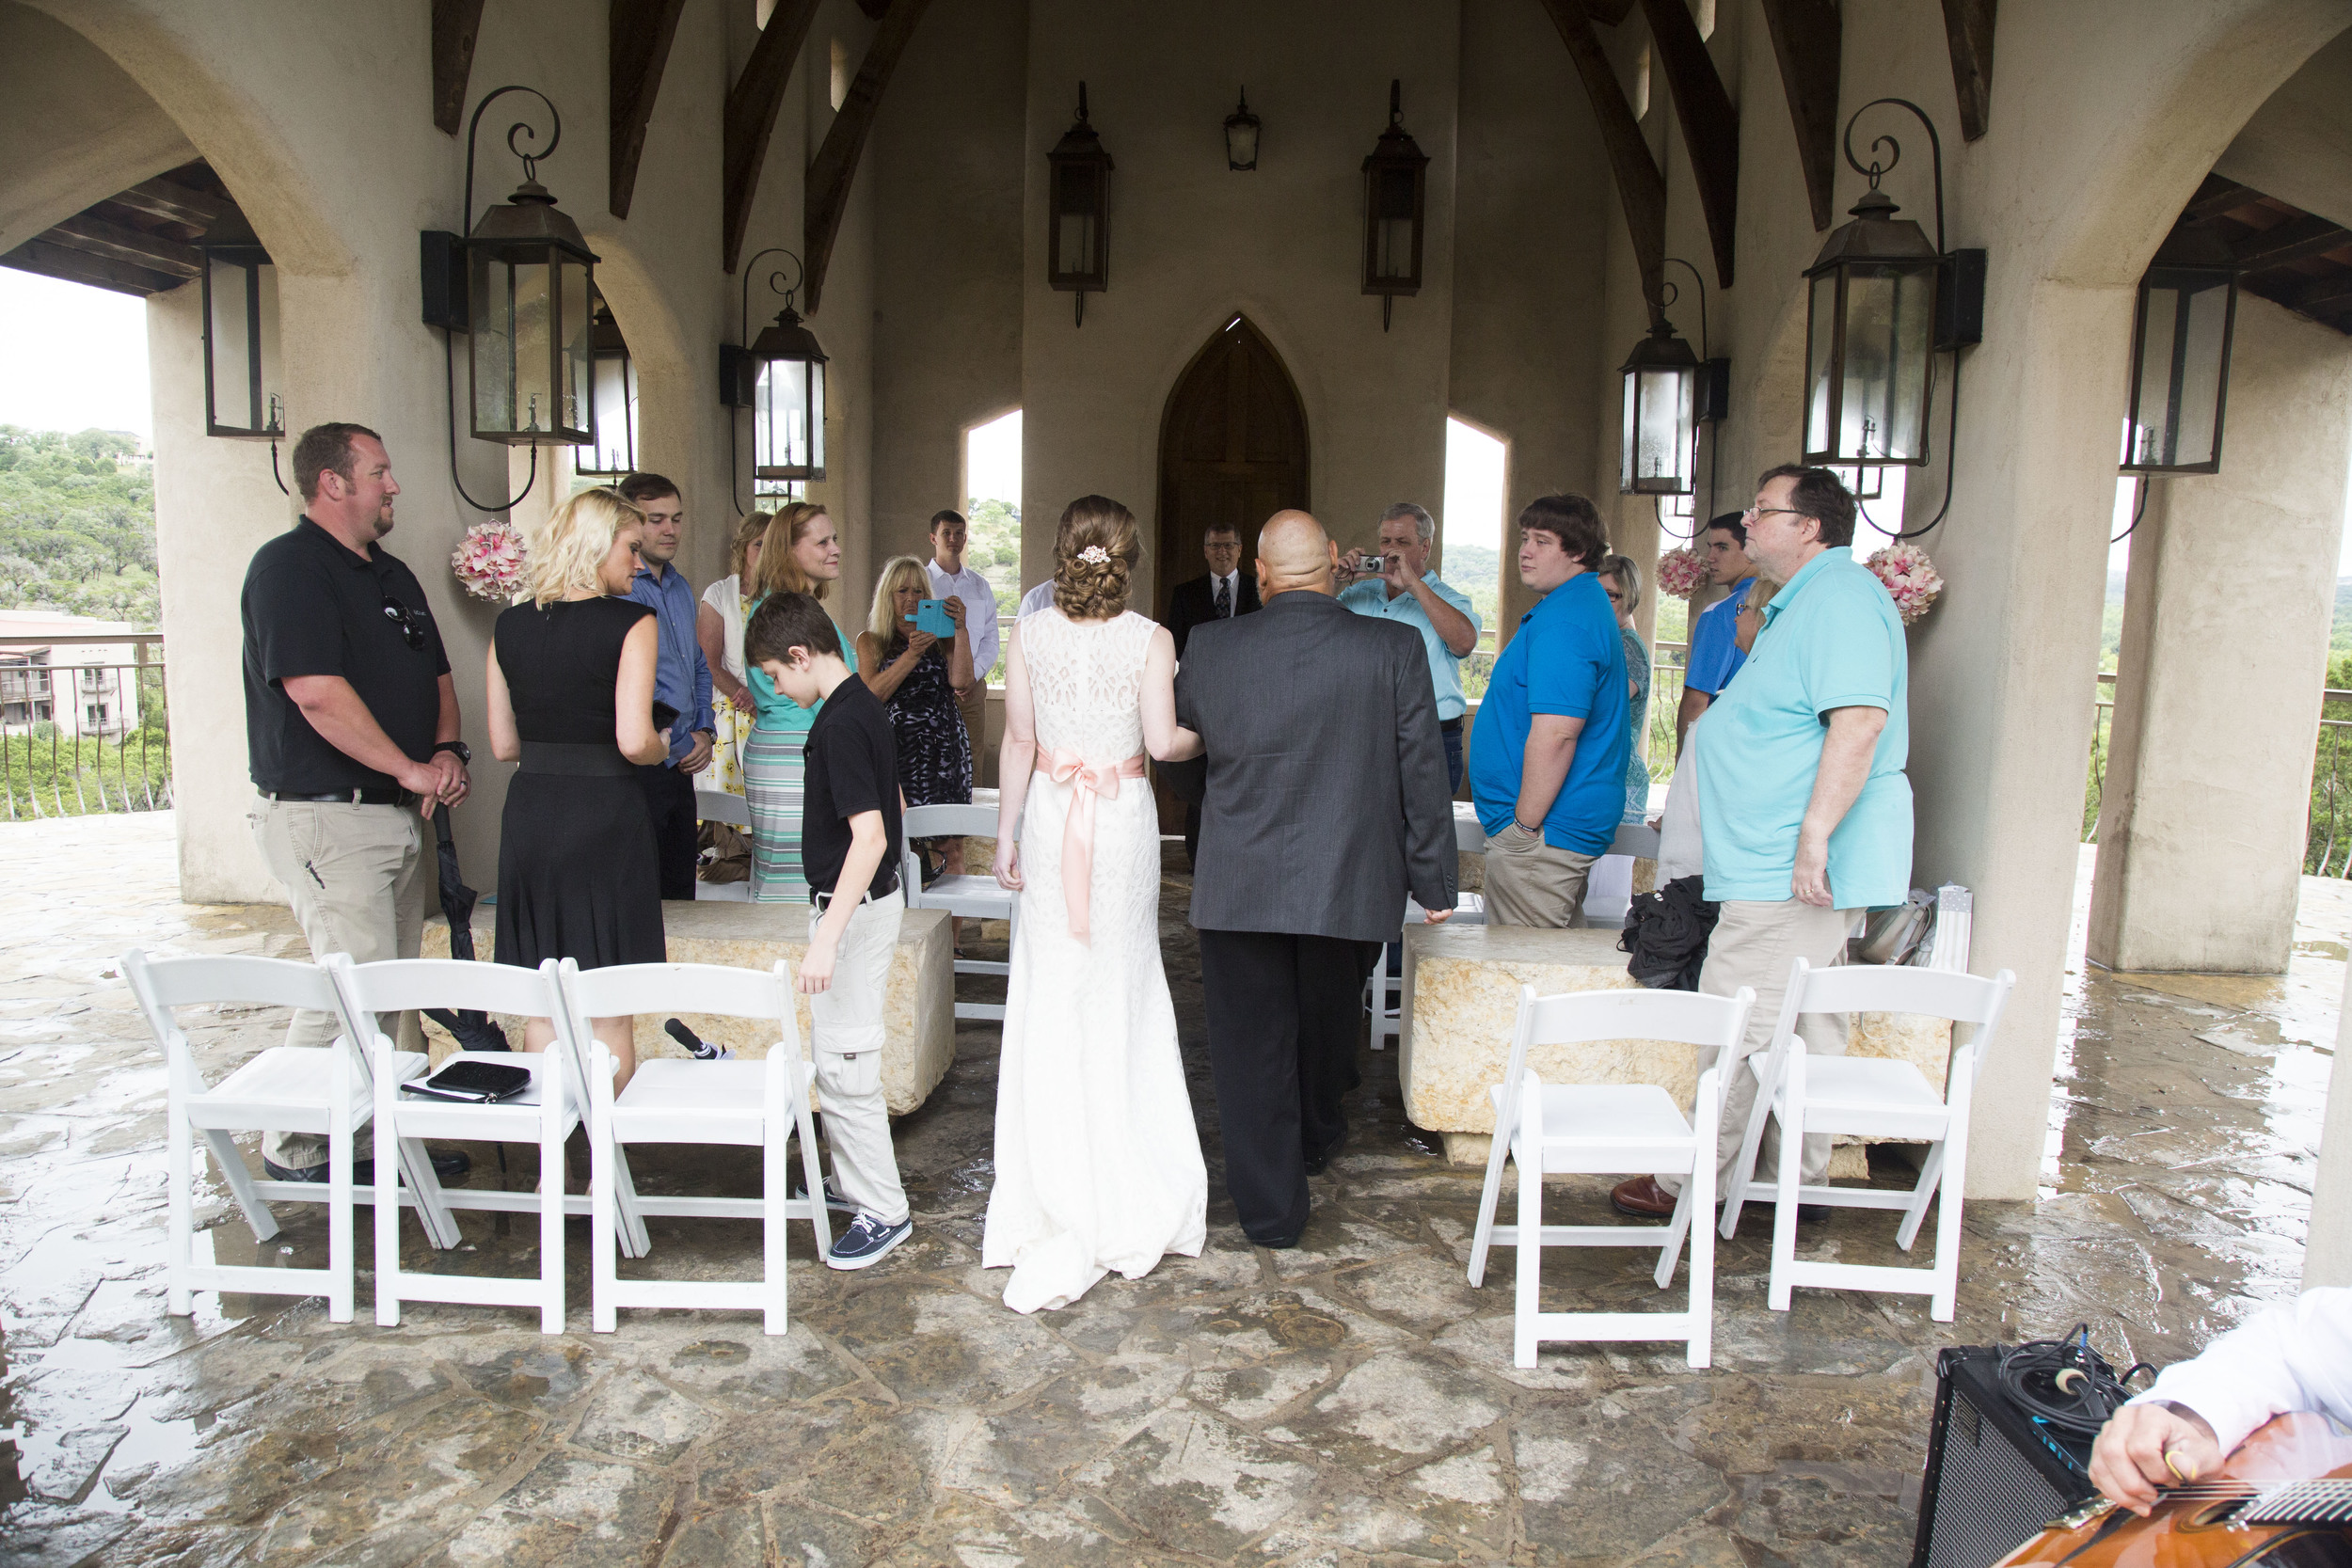 ATGI_Nicole & Patrick Wedding_2016_2S8A6414.jpg